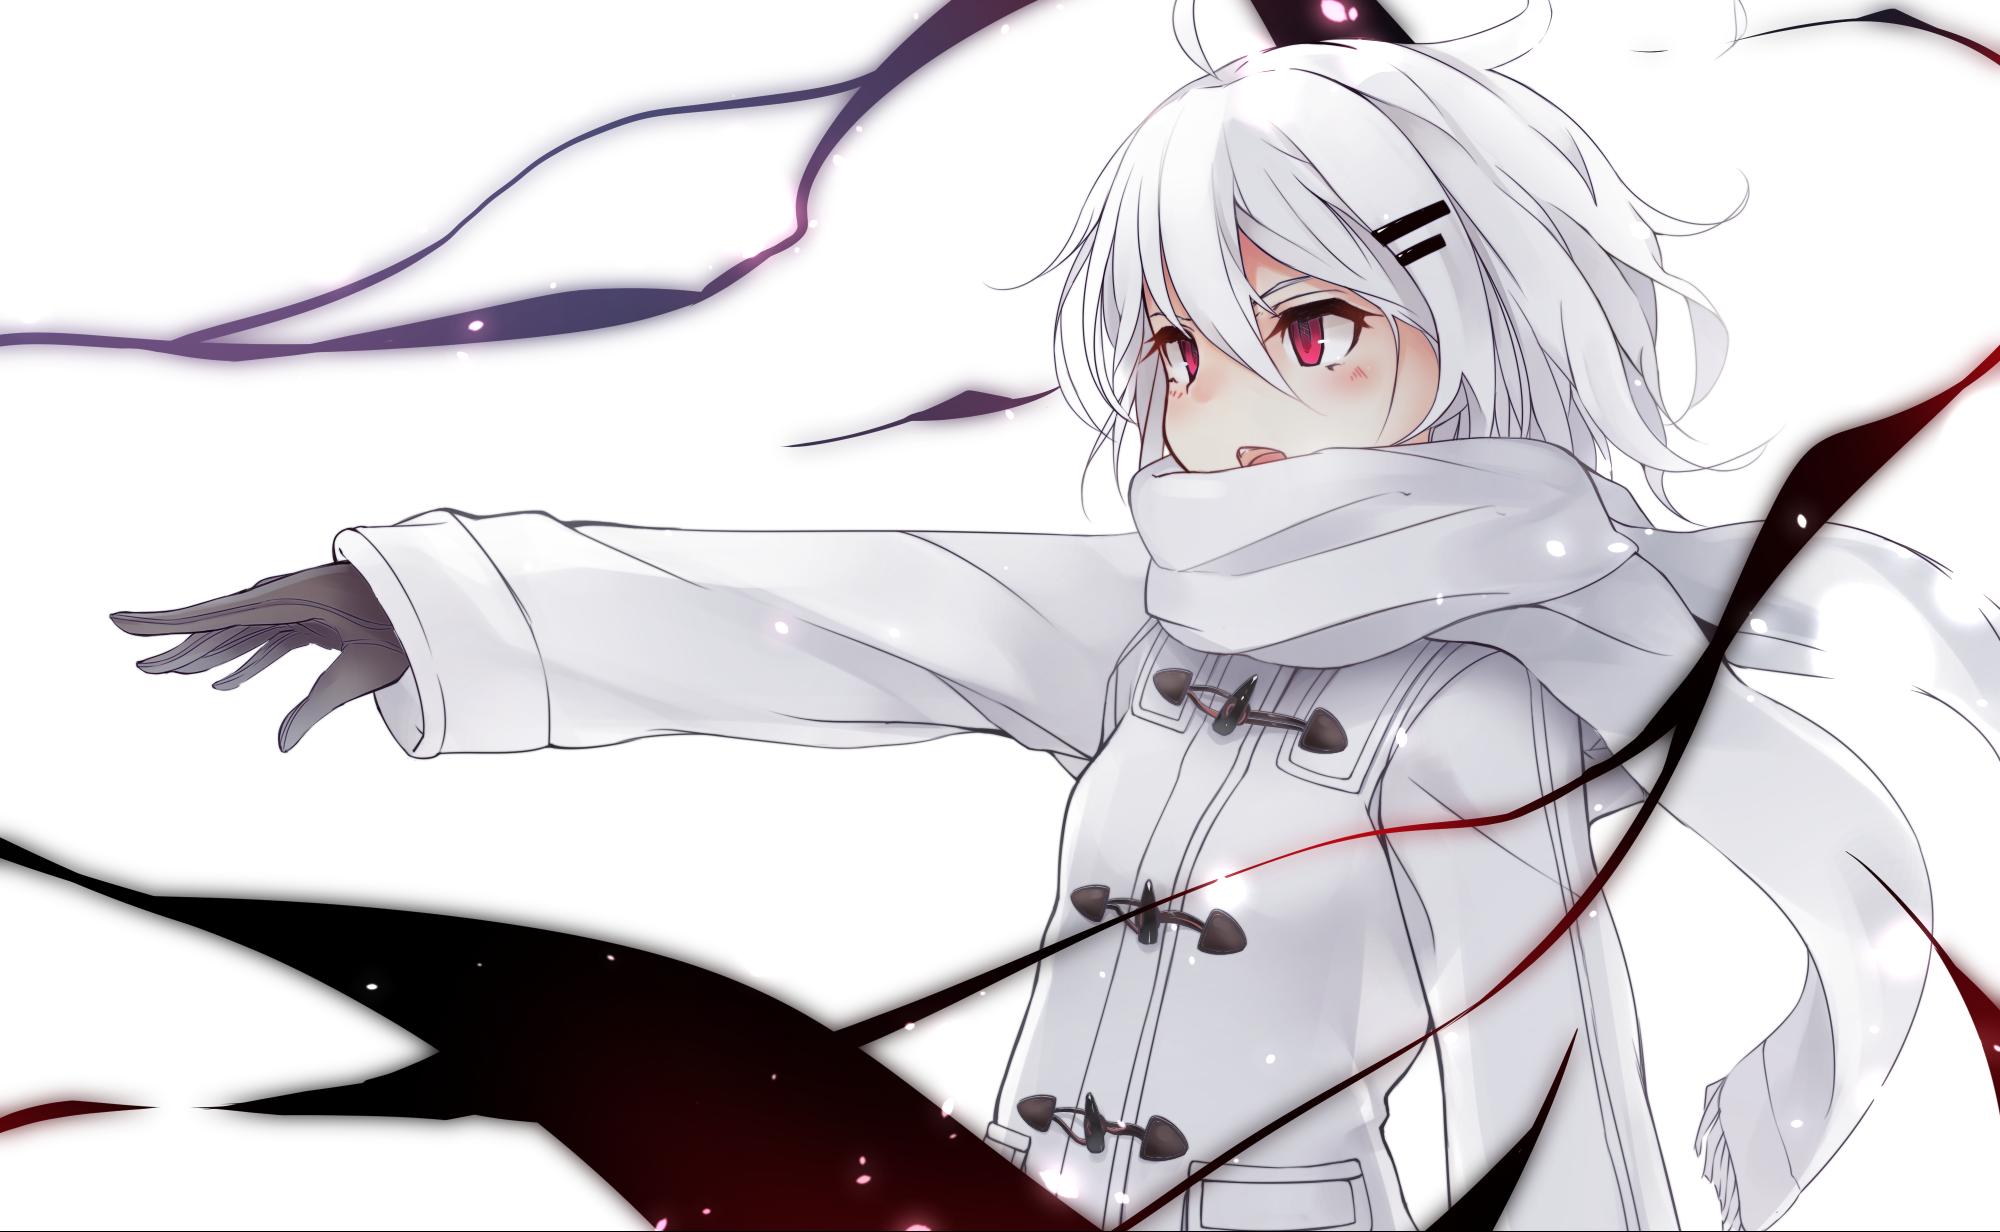 Hd Wallpaper - Haegiwa Ringo Chan Anime , HD Wallpaper & Backgrounds